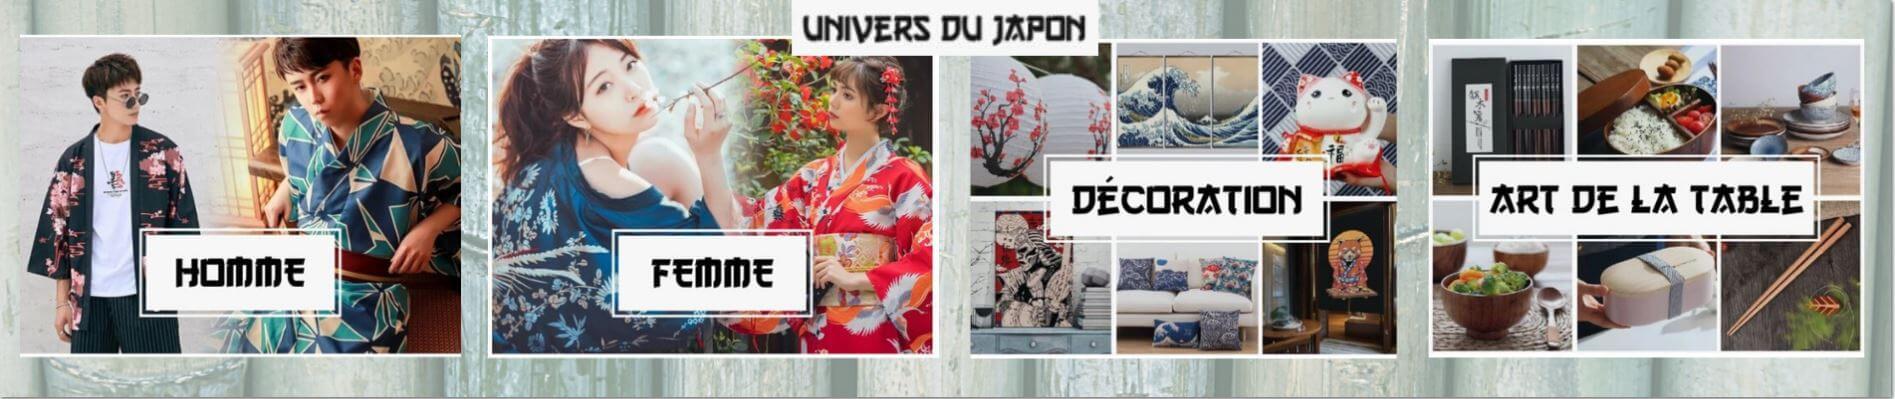 Univers du Japon - MycrazyJapan